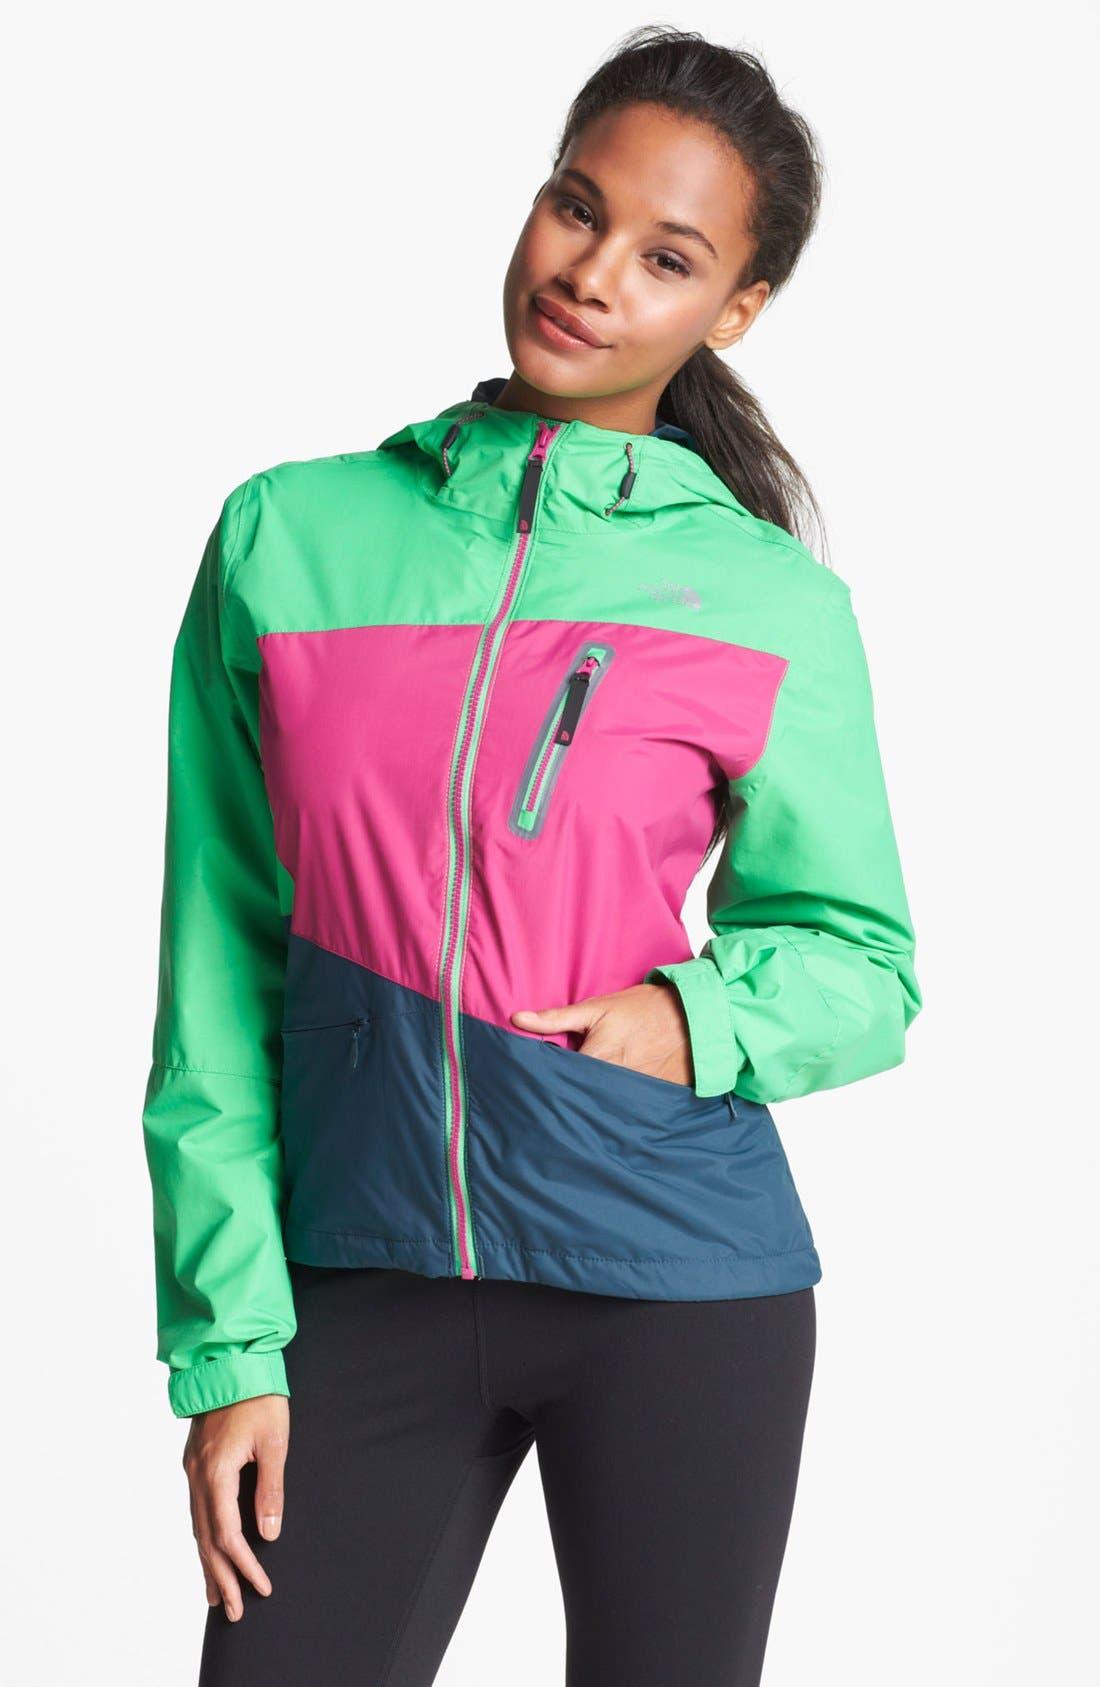 Main Image - The North Face 'Woodchip' Mountain Bike Jacket